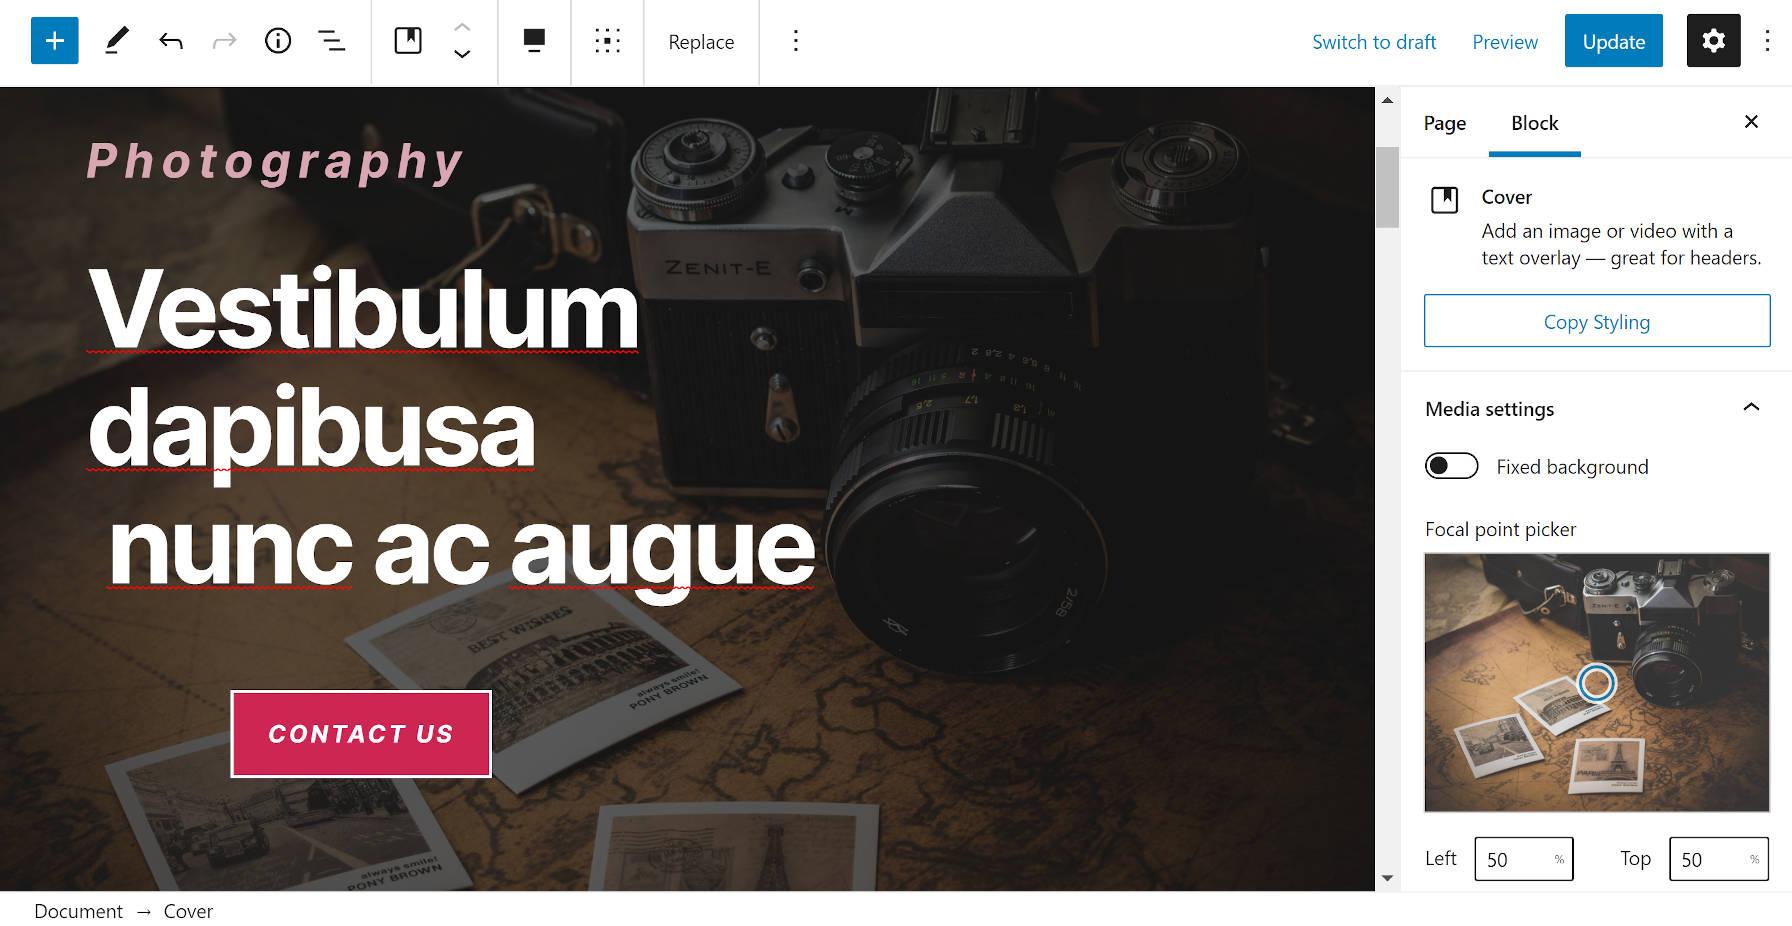 gutenberg-hub-launches-landing-page-templates-directory-1 Gutenberg Hub启动着陆页模板目录